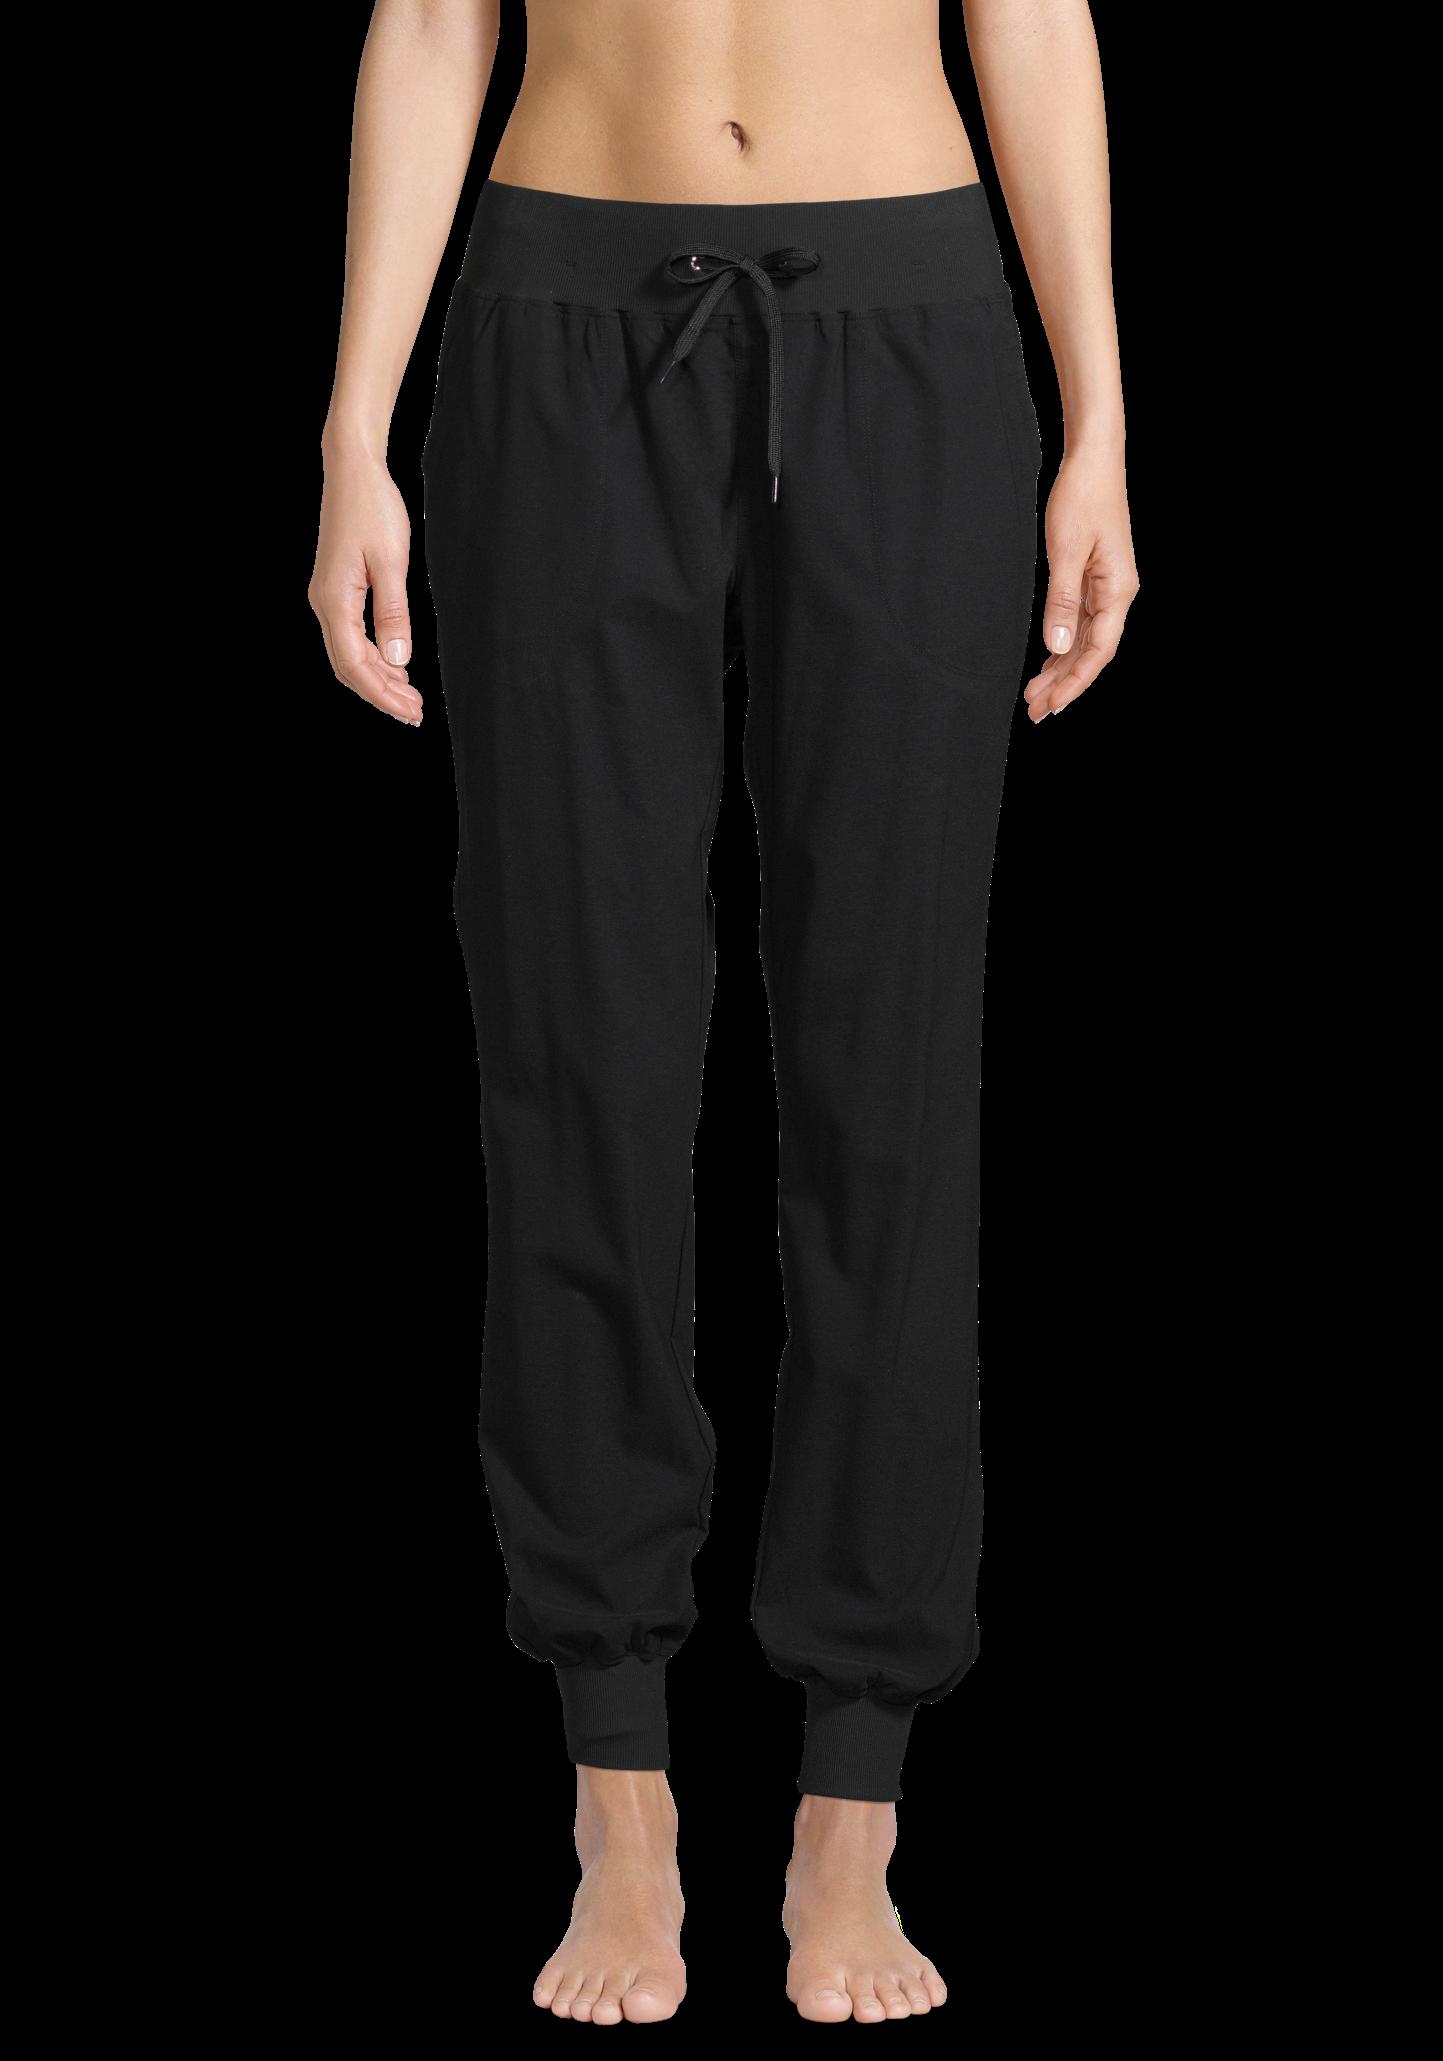 Comfort Pants - Black